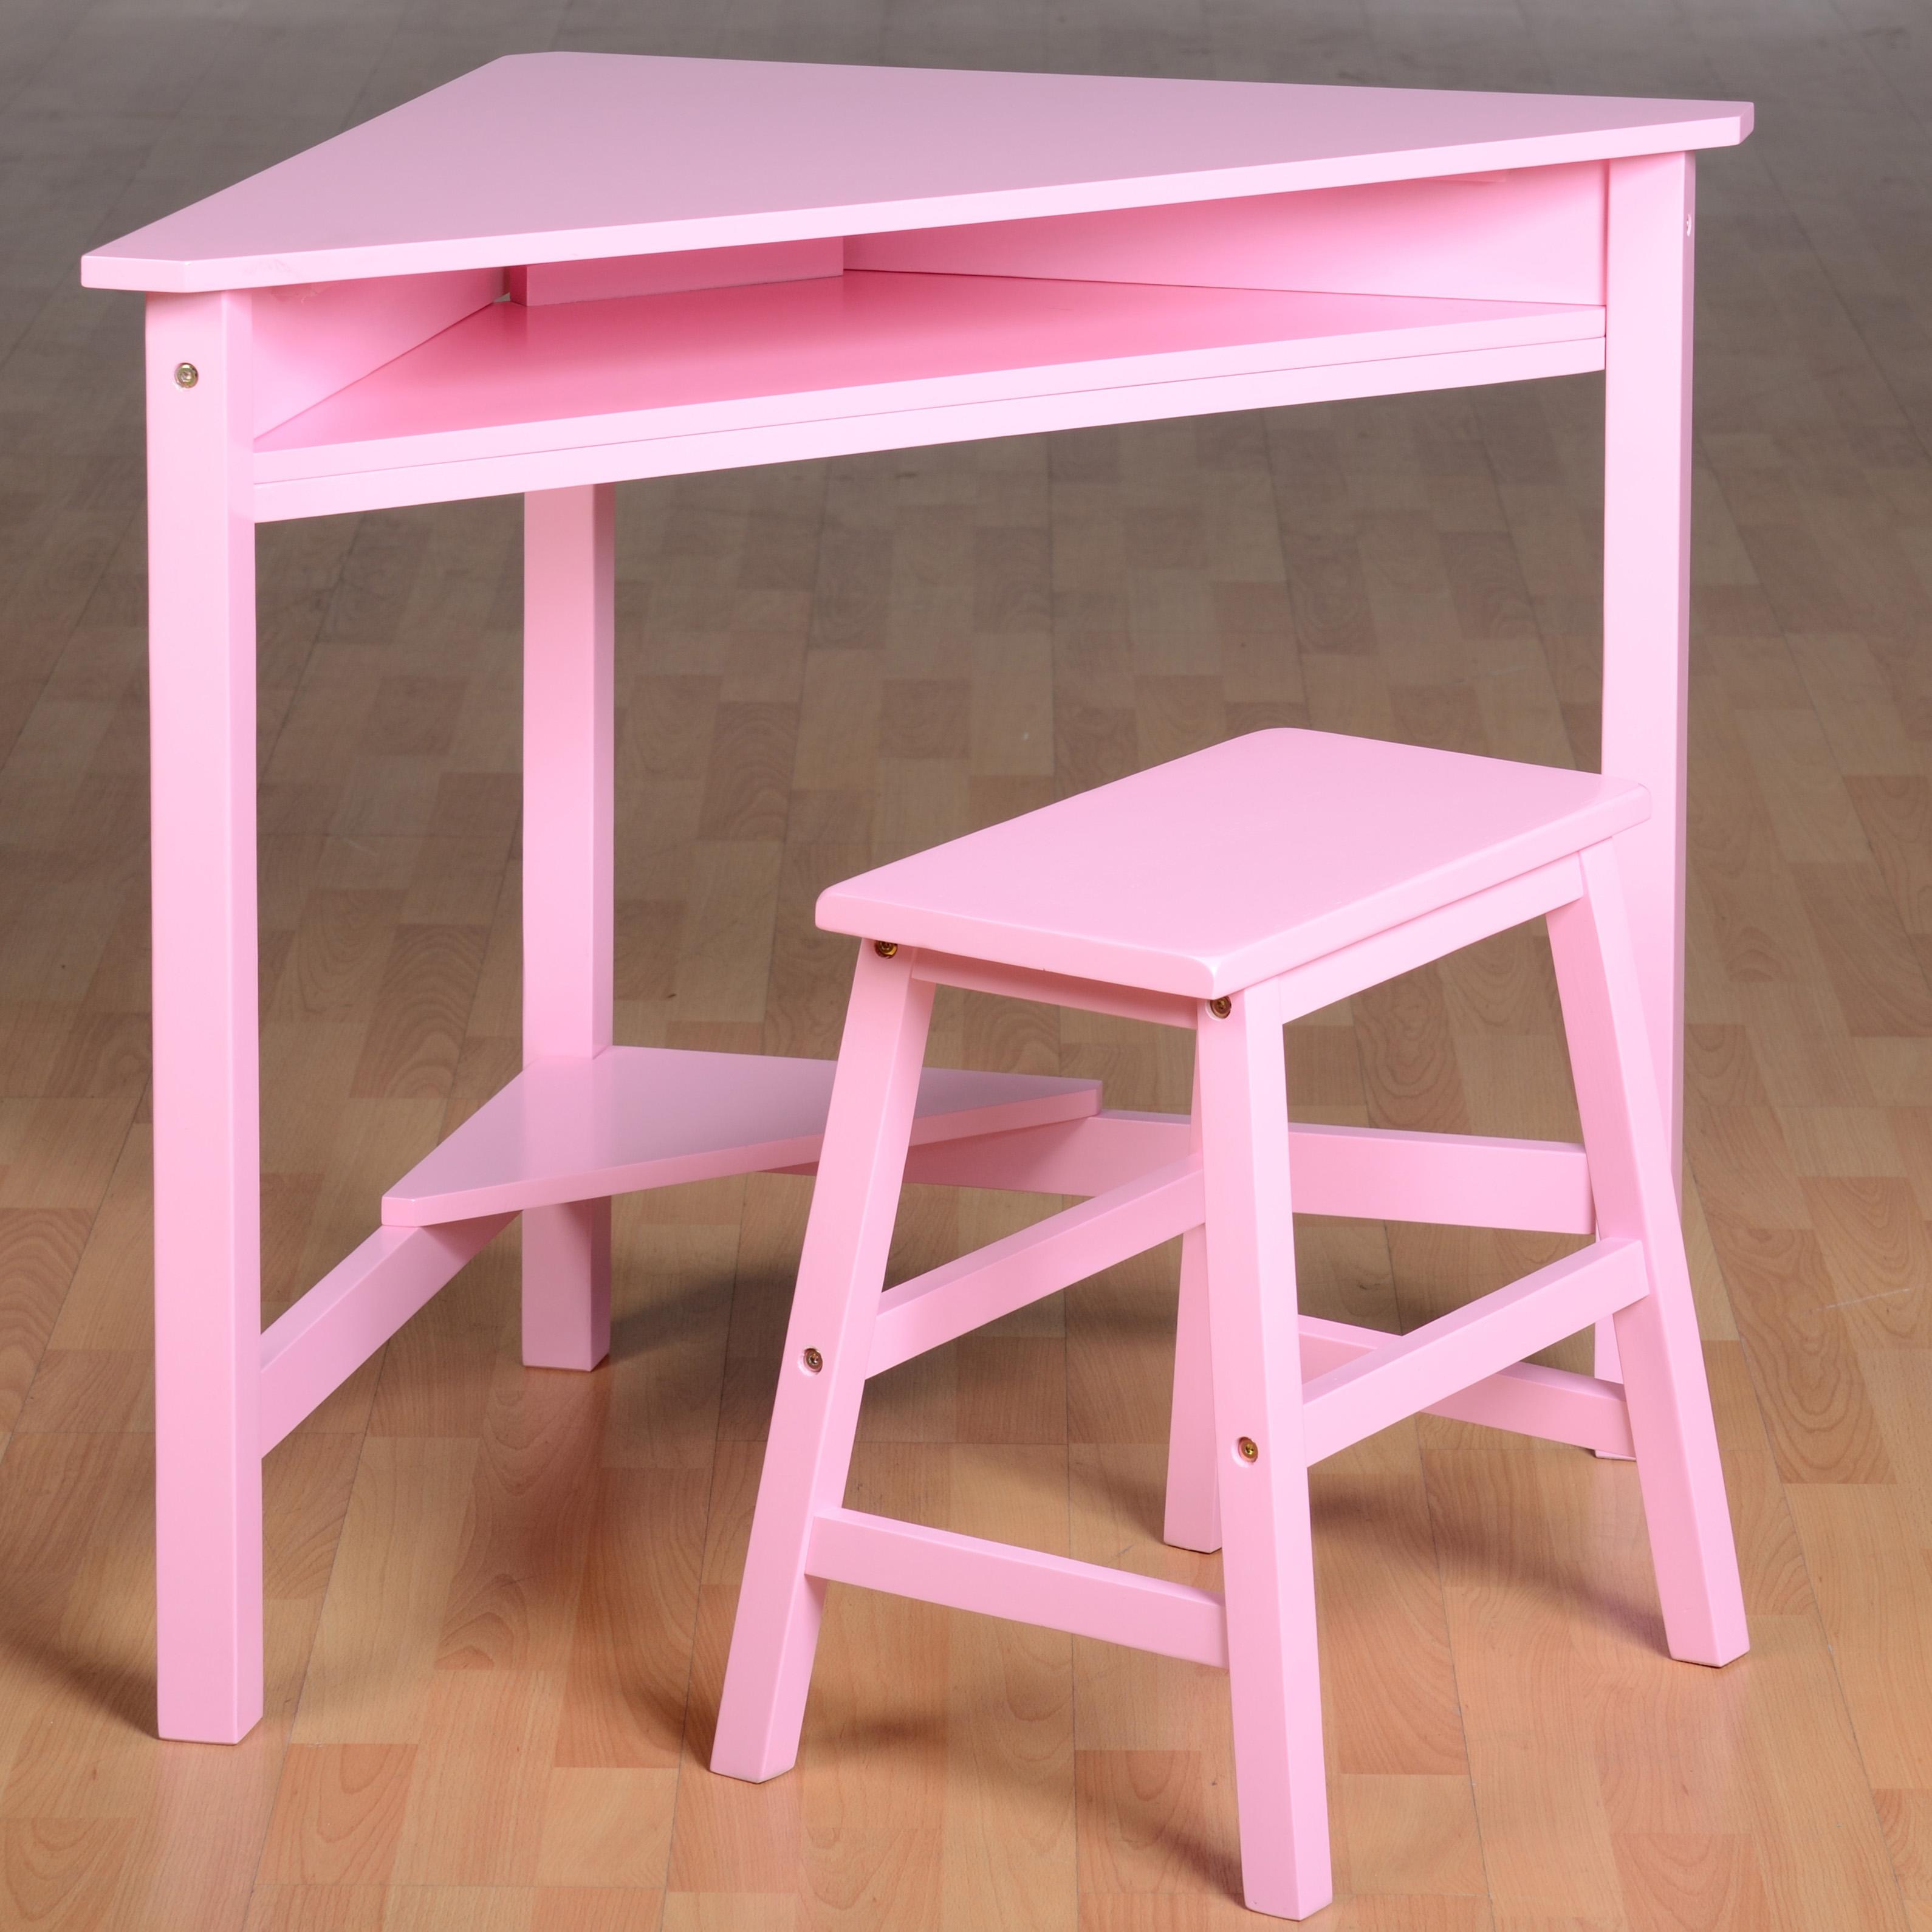 Incredible Kid Desk With Chair Design Homesfeed Creativecarmelina Interior Chair Design Creativecarmelinacom